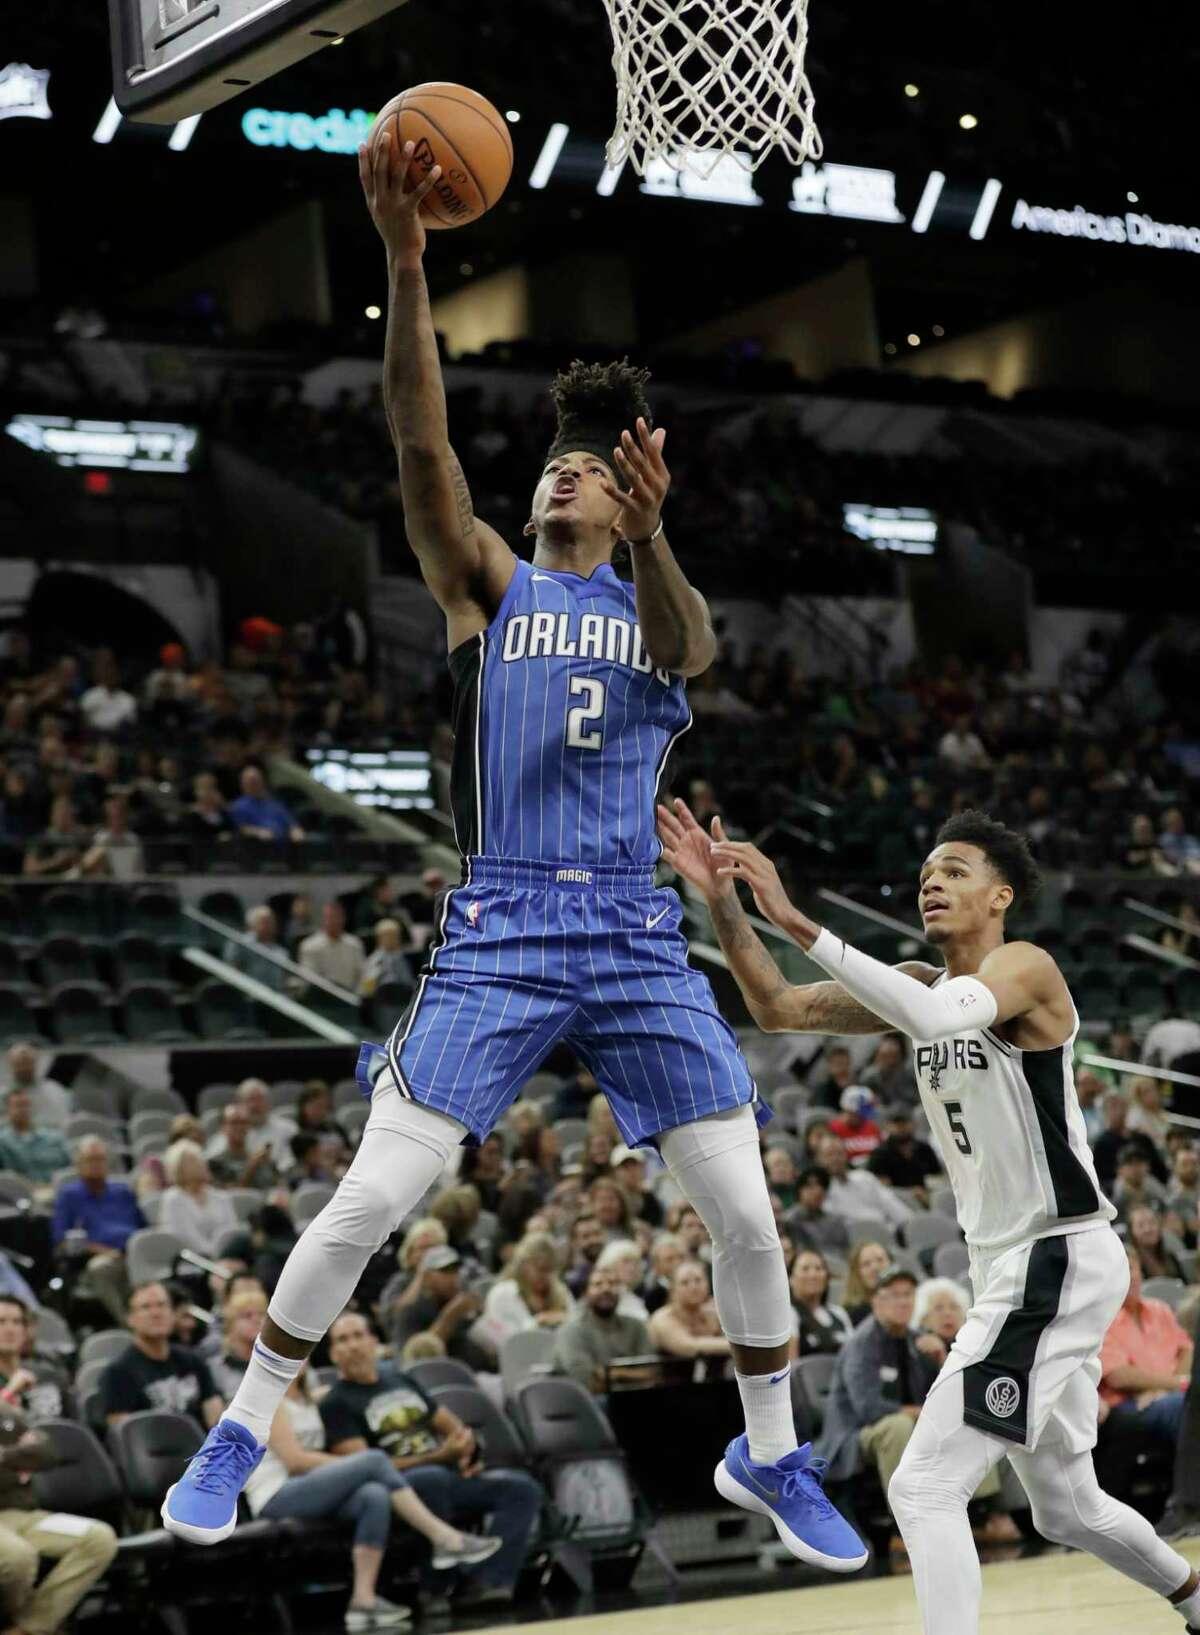 Orlando Magic guard Elfrid Payton (2) scores past San Antonio Spurs guard Dejounte Murray (5) during the first half of a preseason NBA basketball game, Tuesday, Oct. 10, 2017, in San Antonio. (AP Photo/Eric Gay)